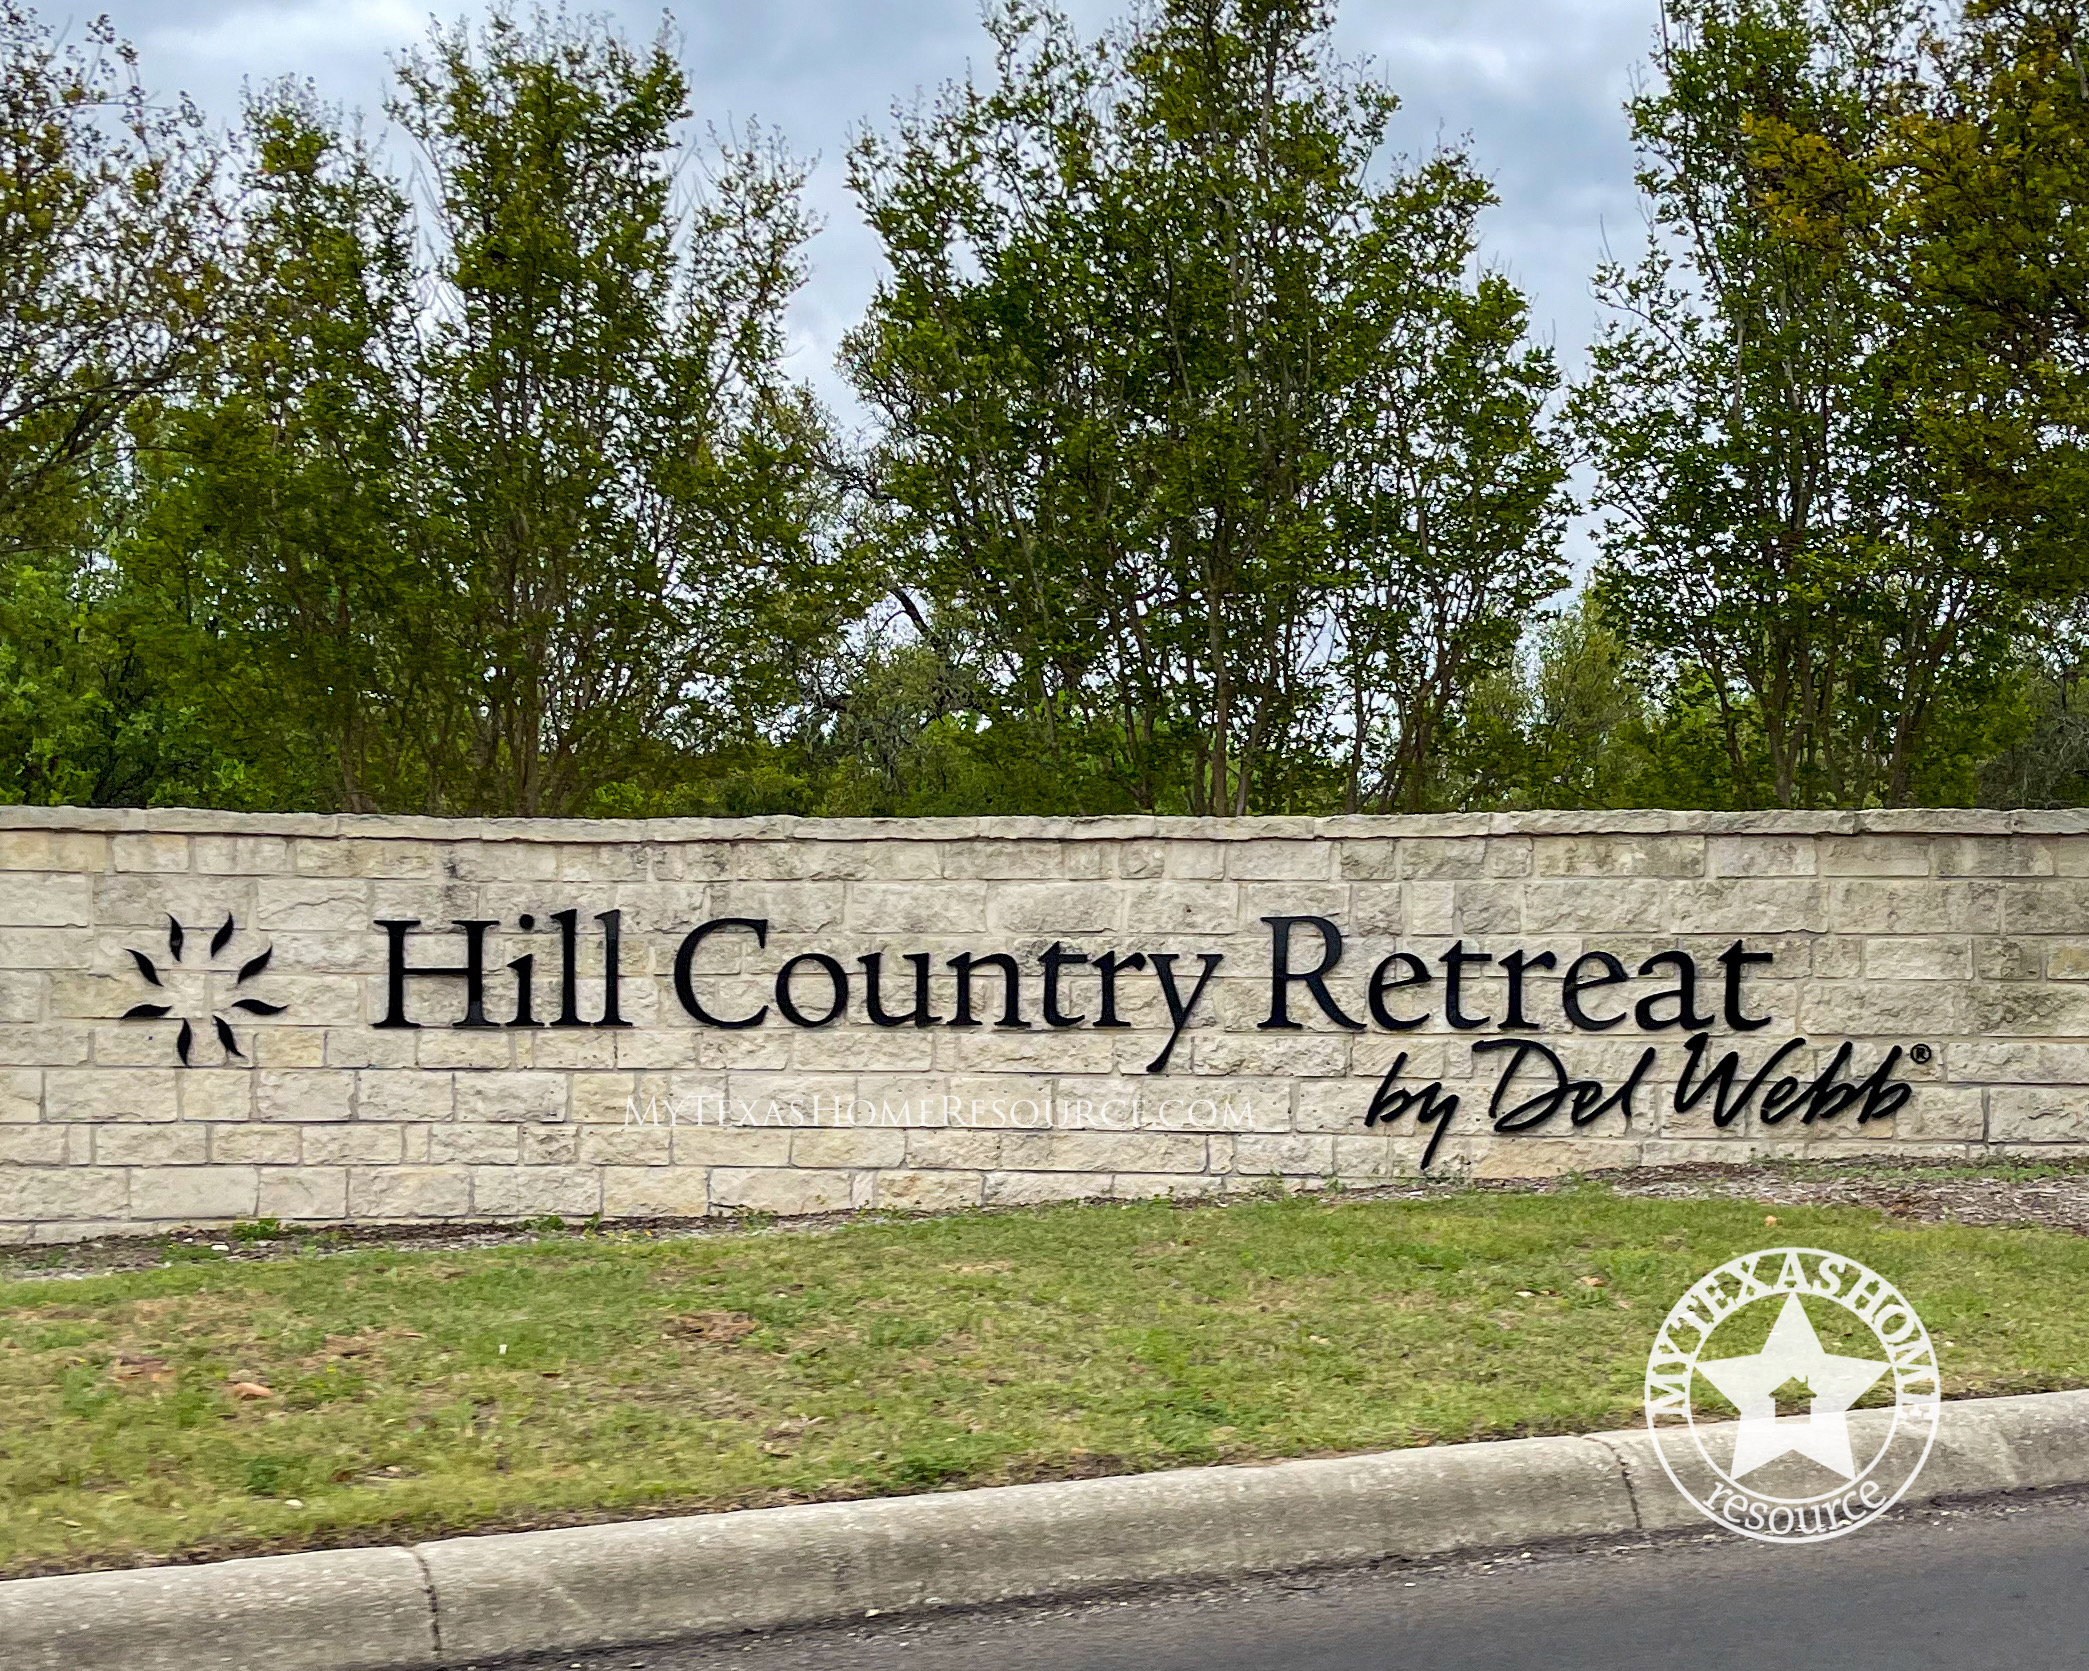 Hill Country Retreat Community San Antonio, TX